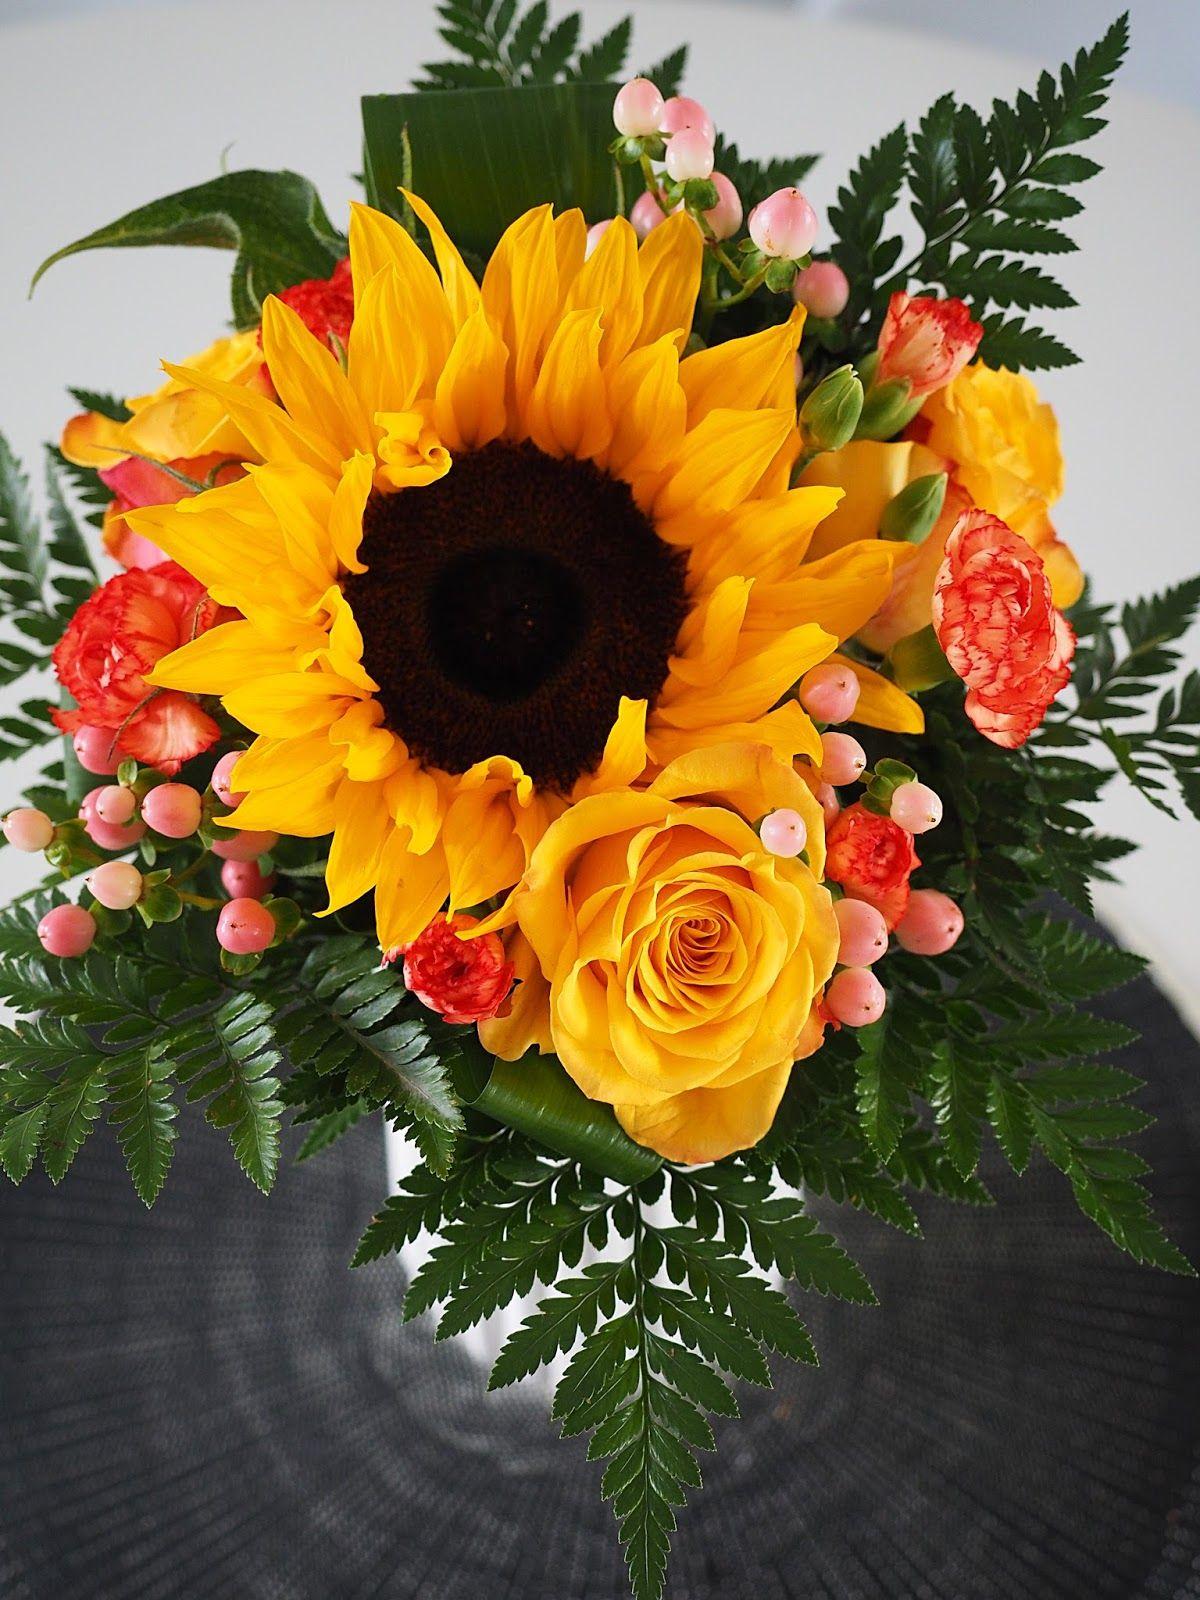 Flowers and SWEET MUD CAKE - Interior Dreams